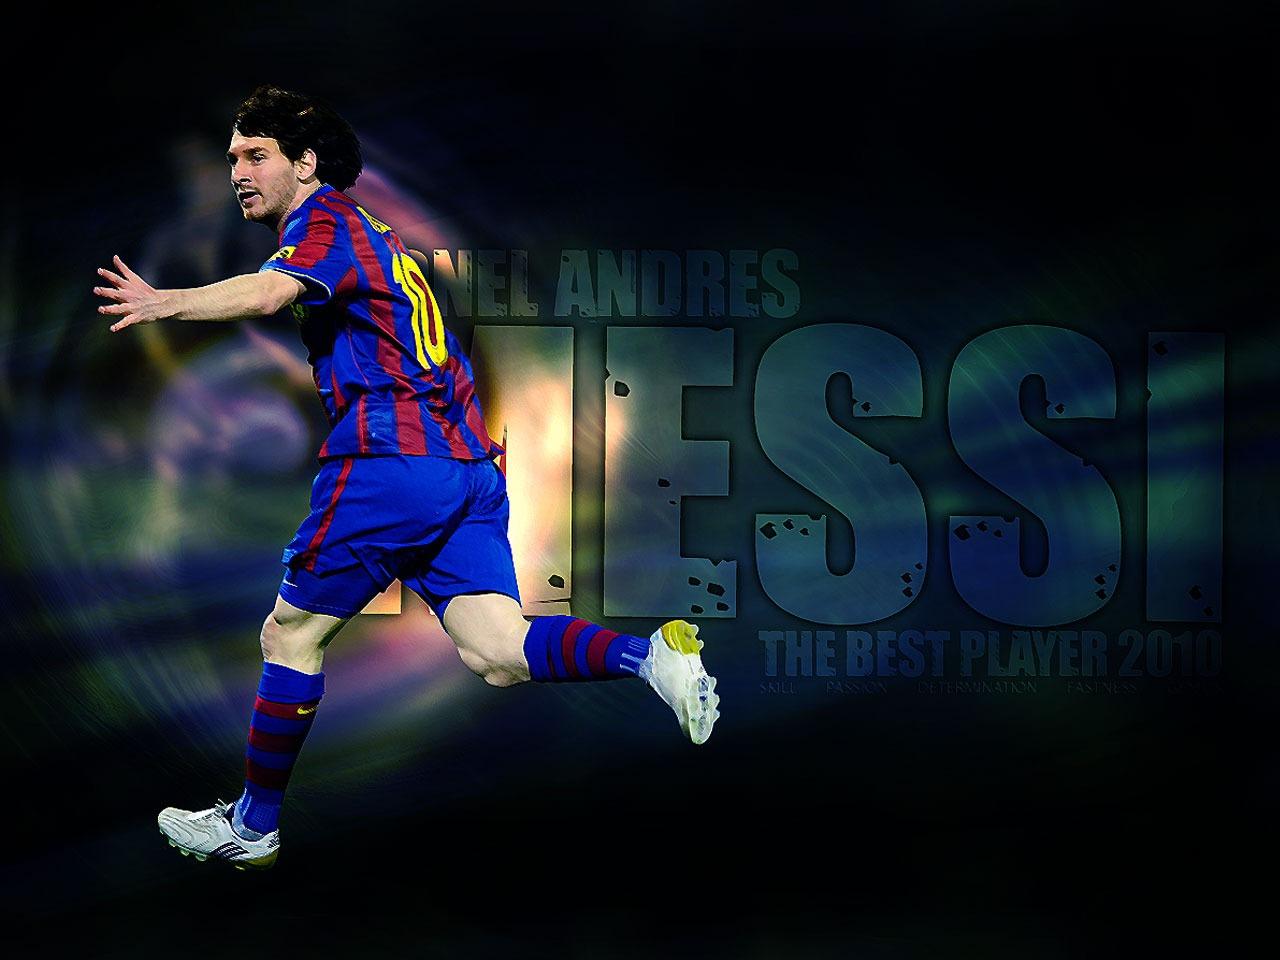 Lionel Messi hd Wallpaper 1280x960